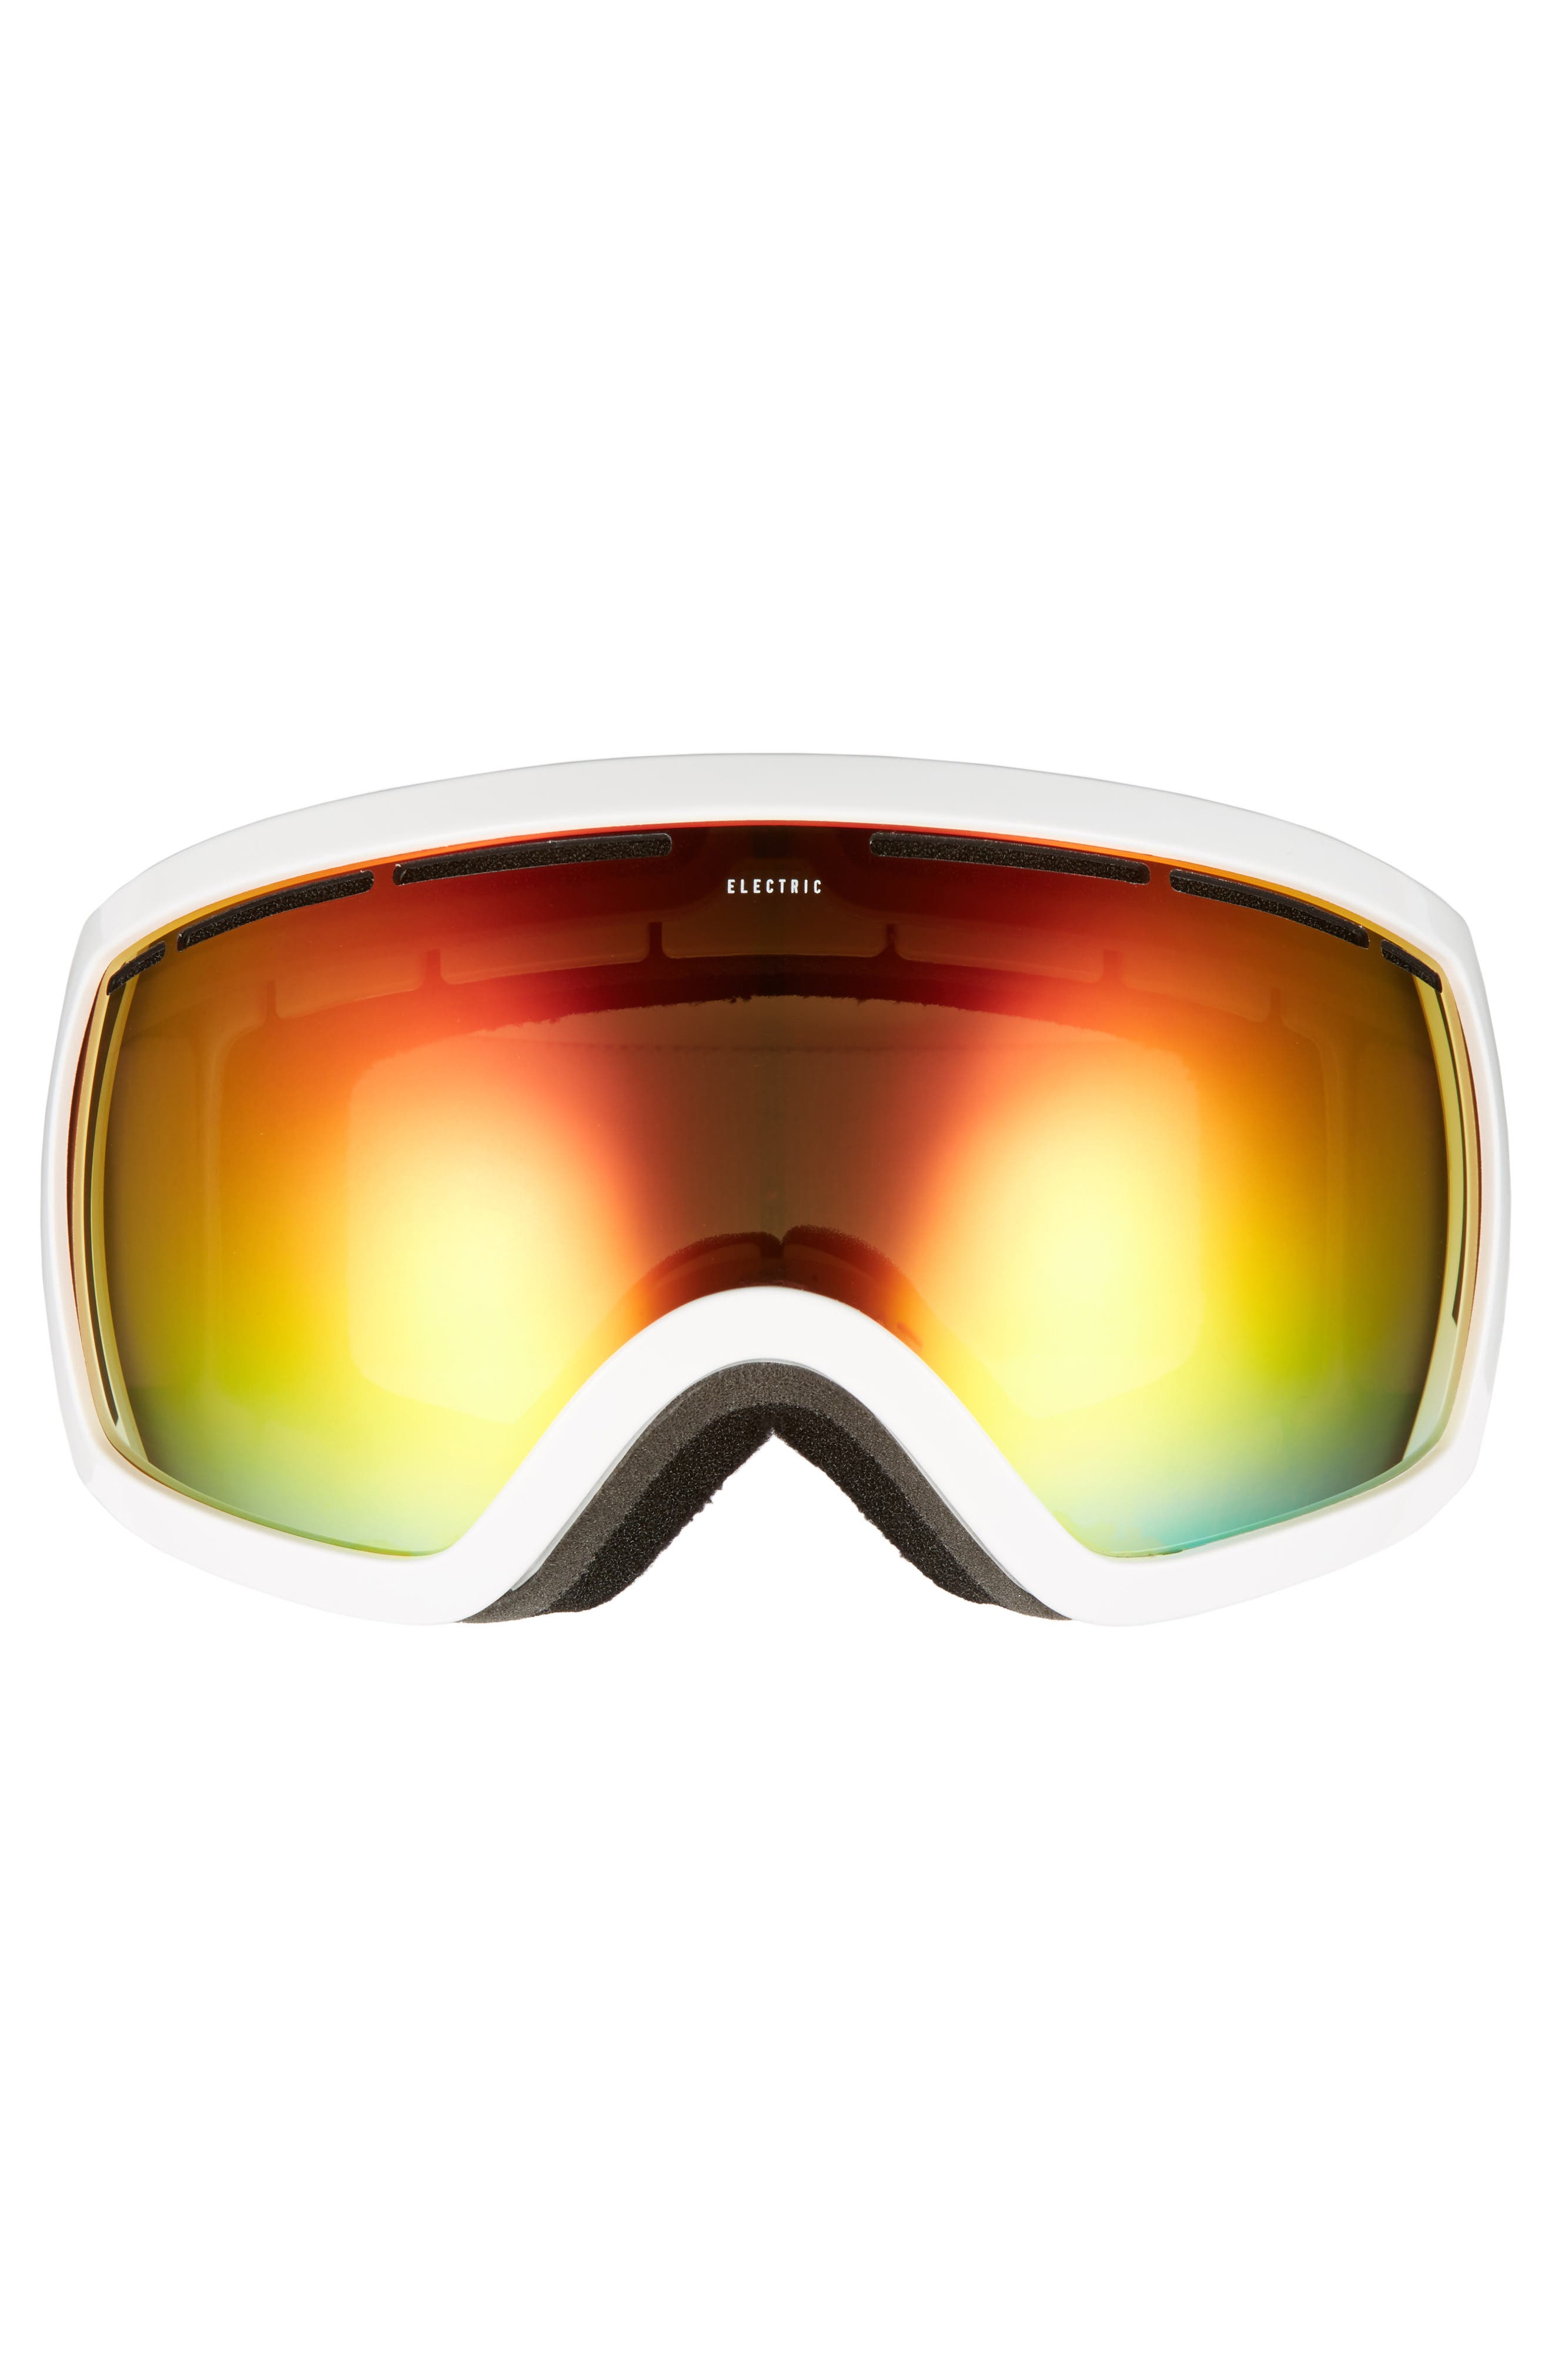 EG2.5 Snow Goggles,                             Alternate thumbnail 15, color,